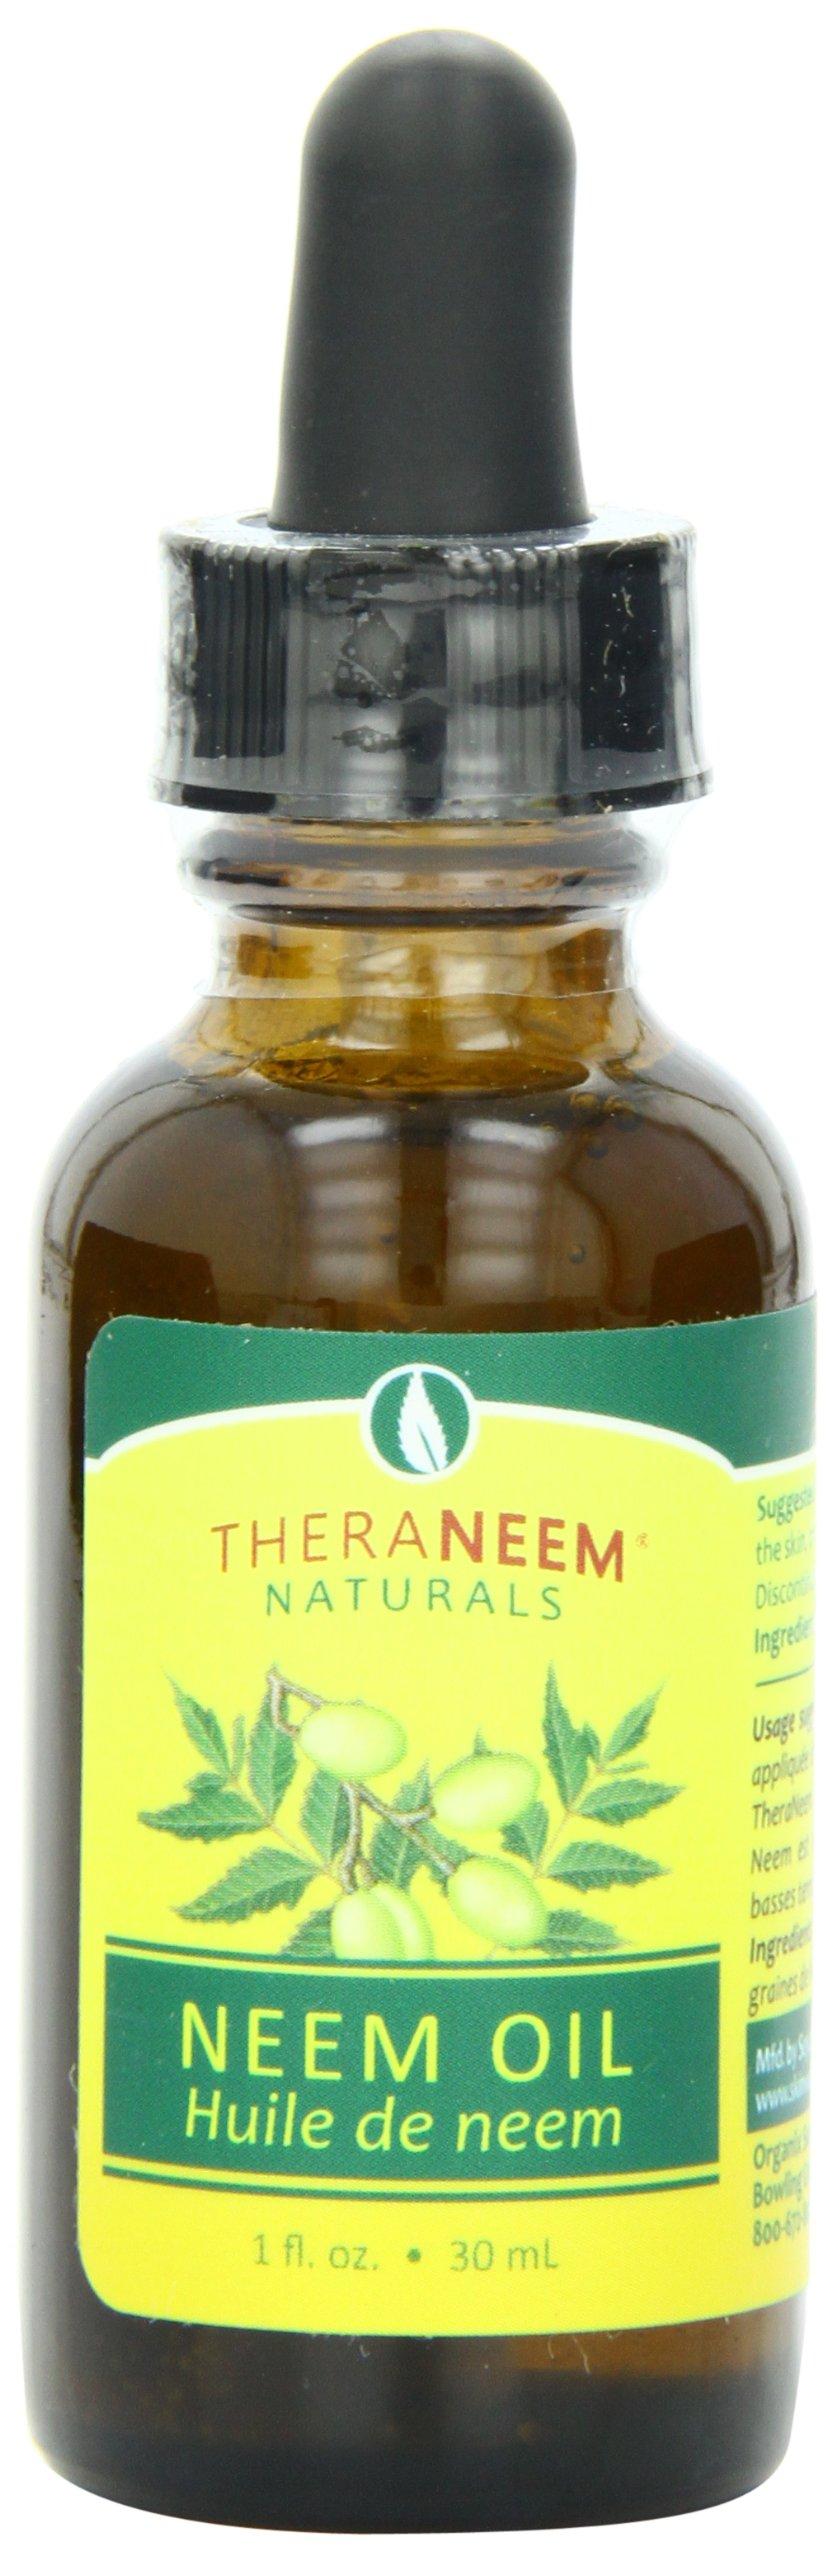 Theraneem Neem Oil